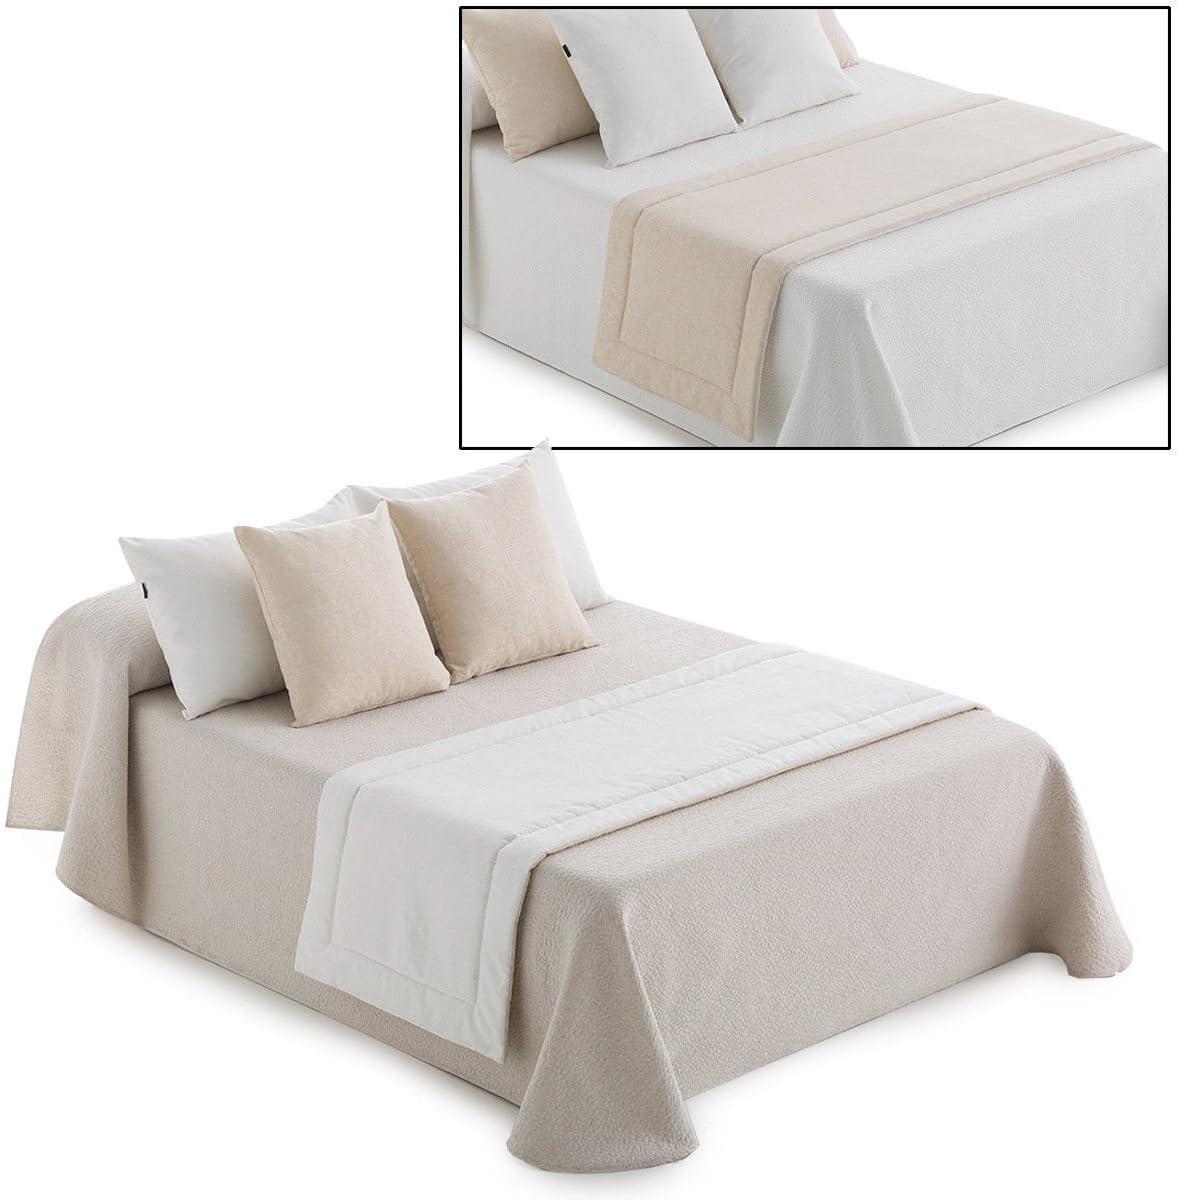 dimensioni varie Q922 60x220 cm BEIGE Runner trapuntato per letto Dream bicolor reversibile